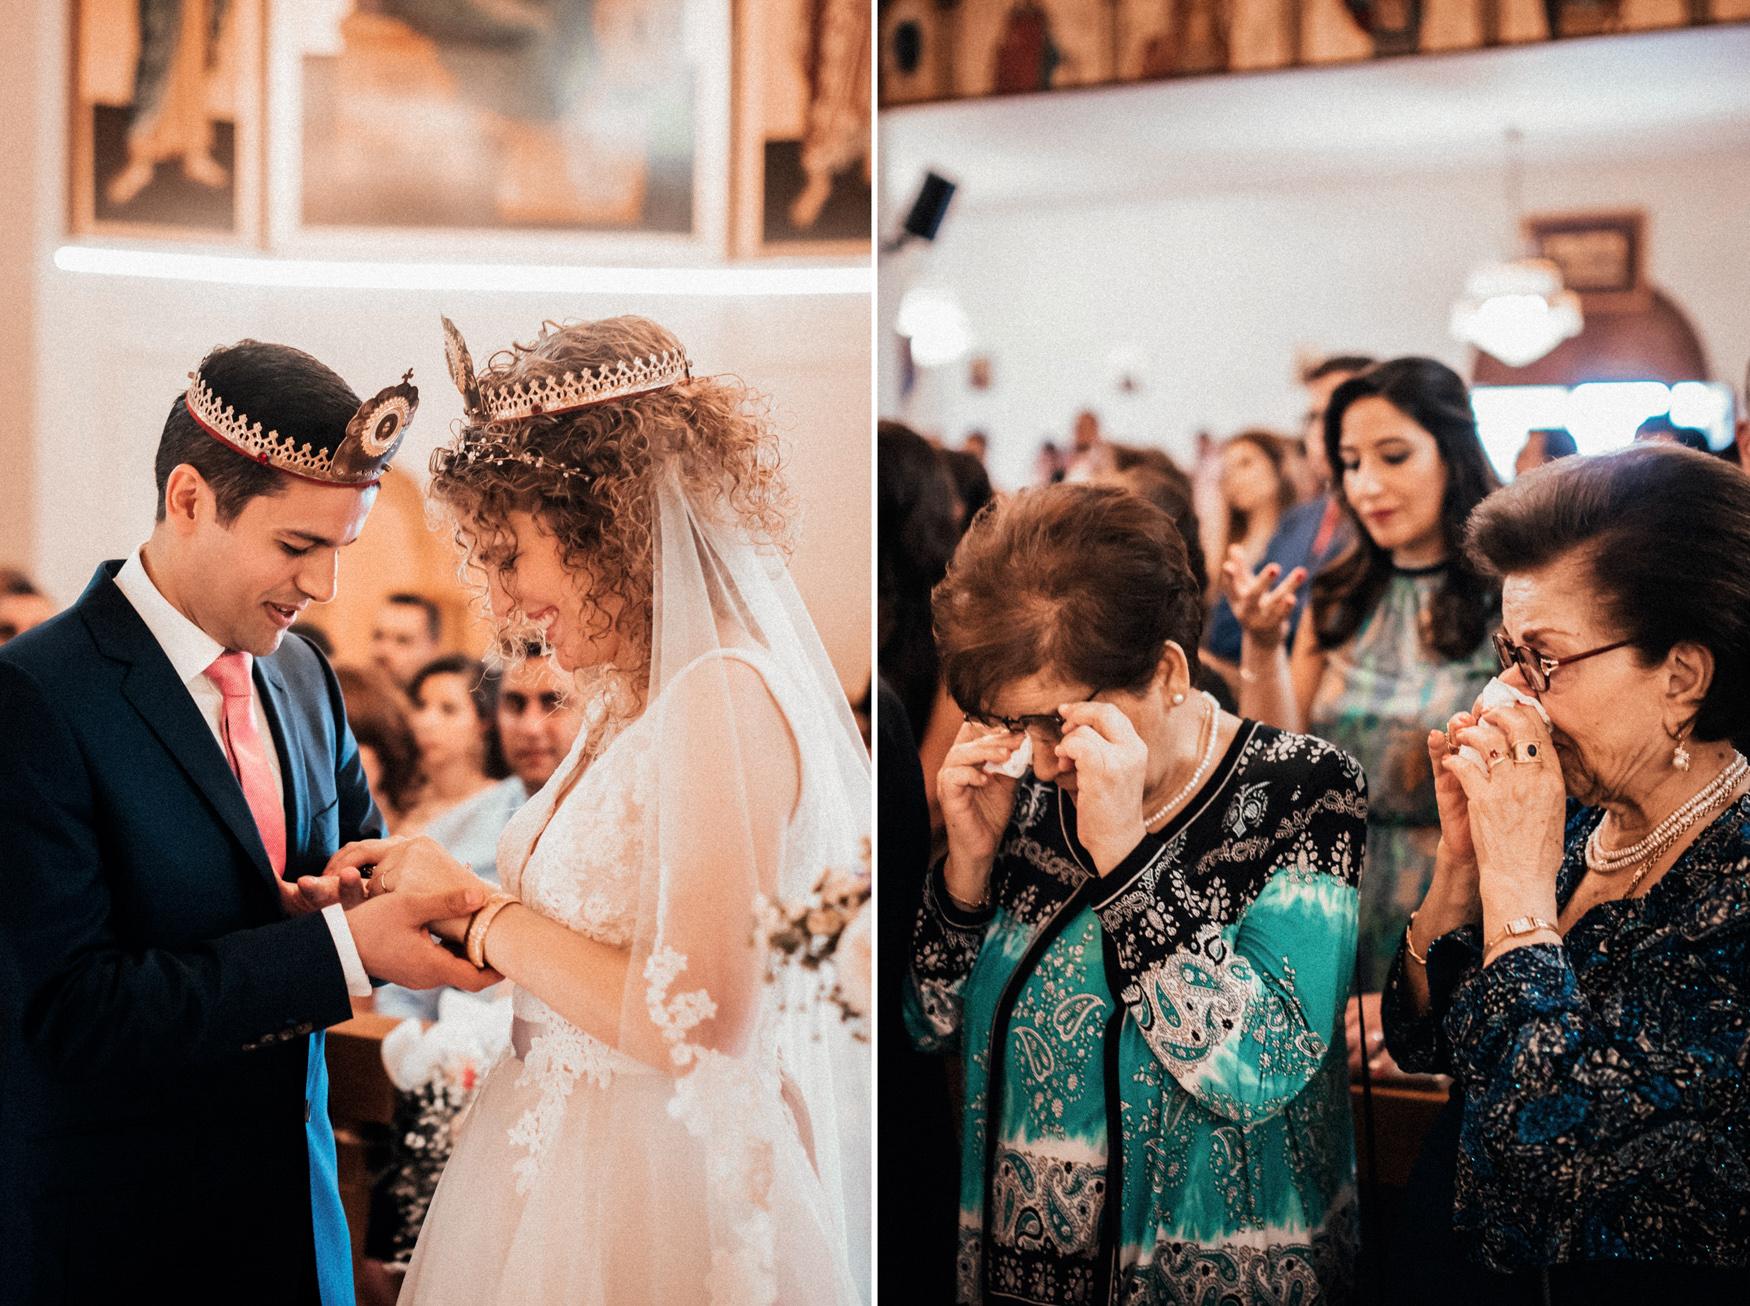 LR3 byblos beirut church wedding ceremony lebanon 012.jpg